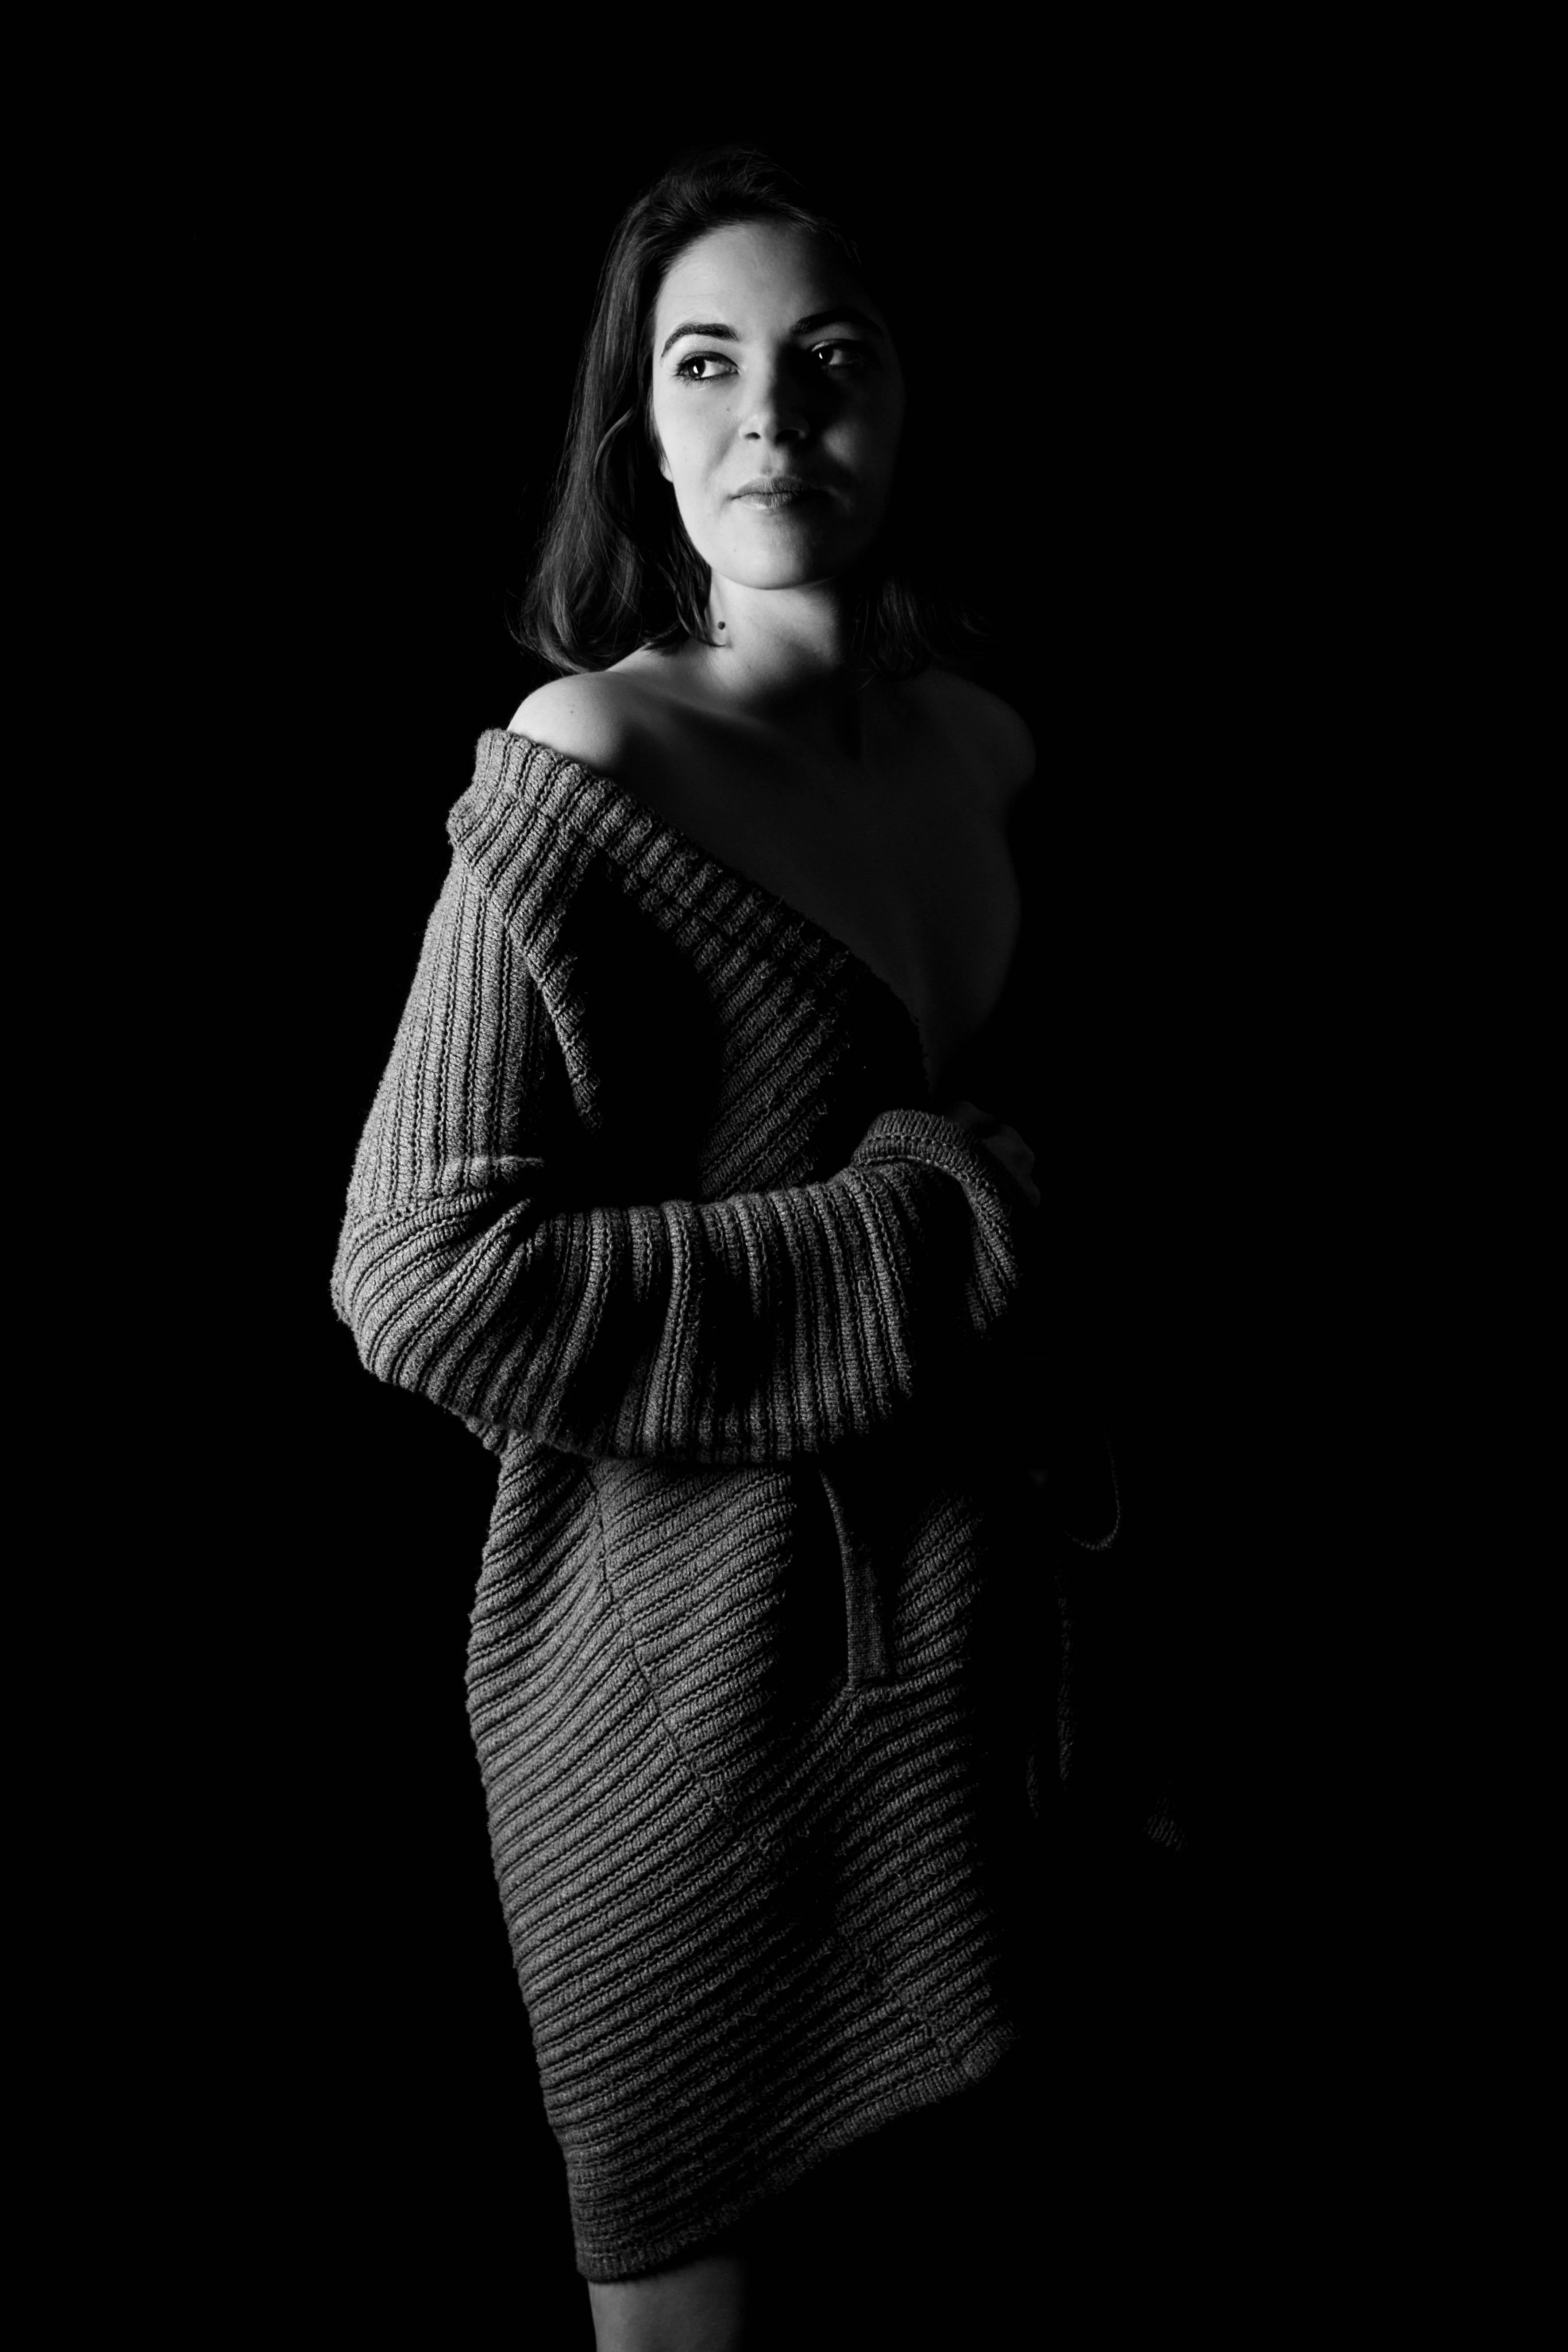 © Alexia Jarry